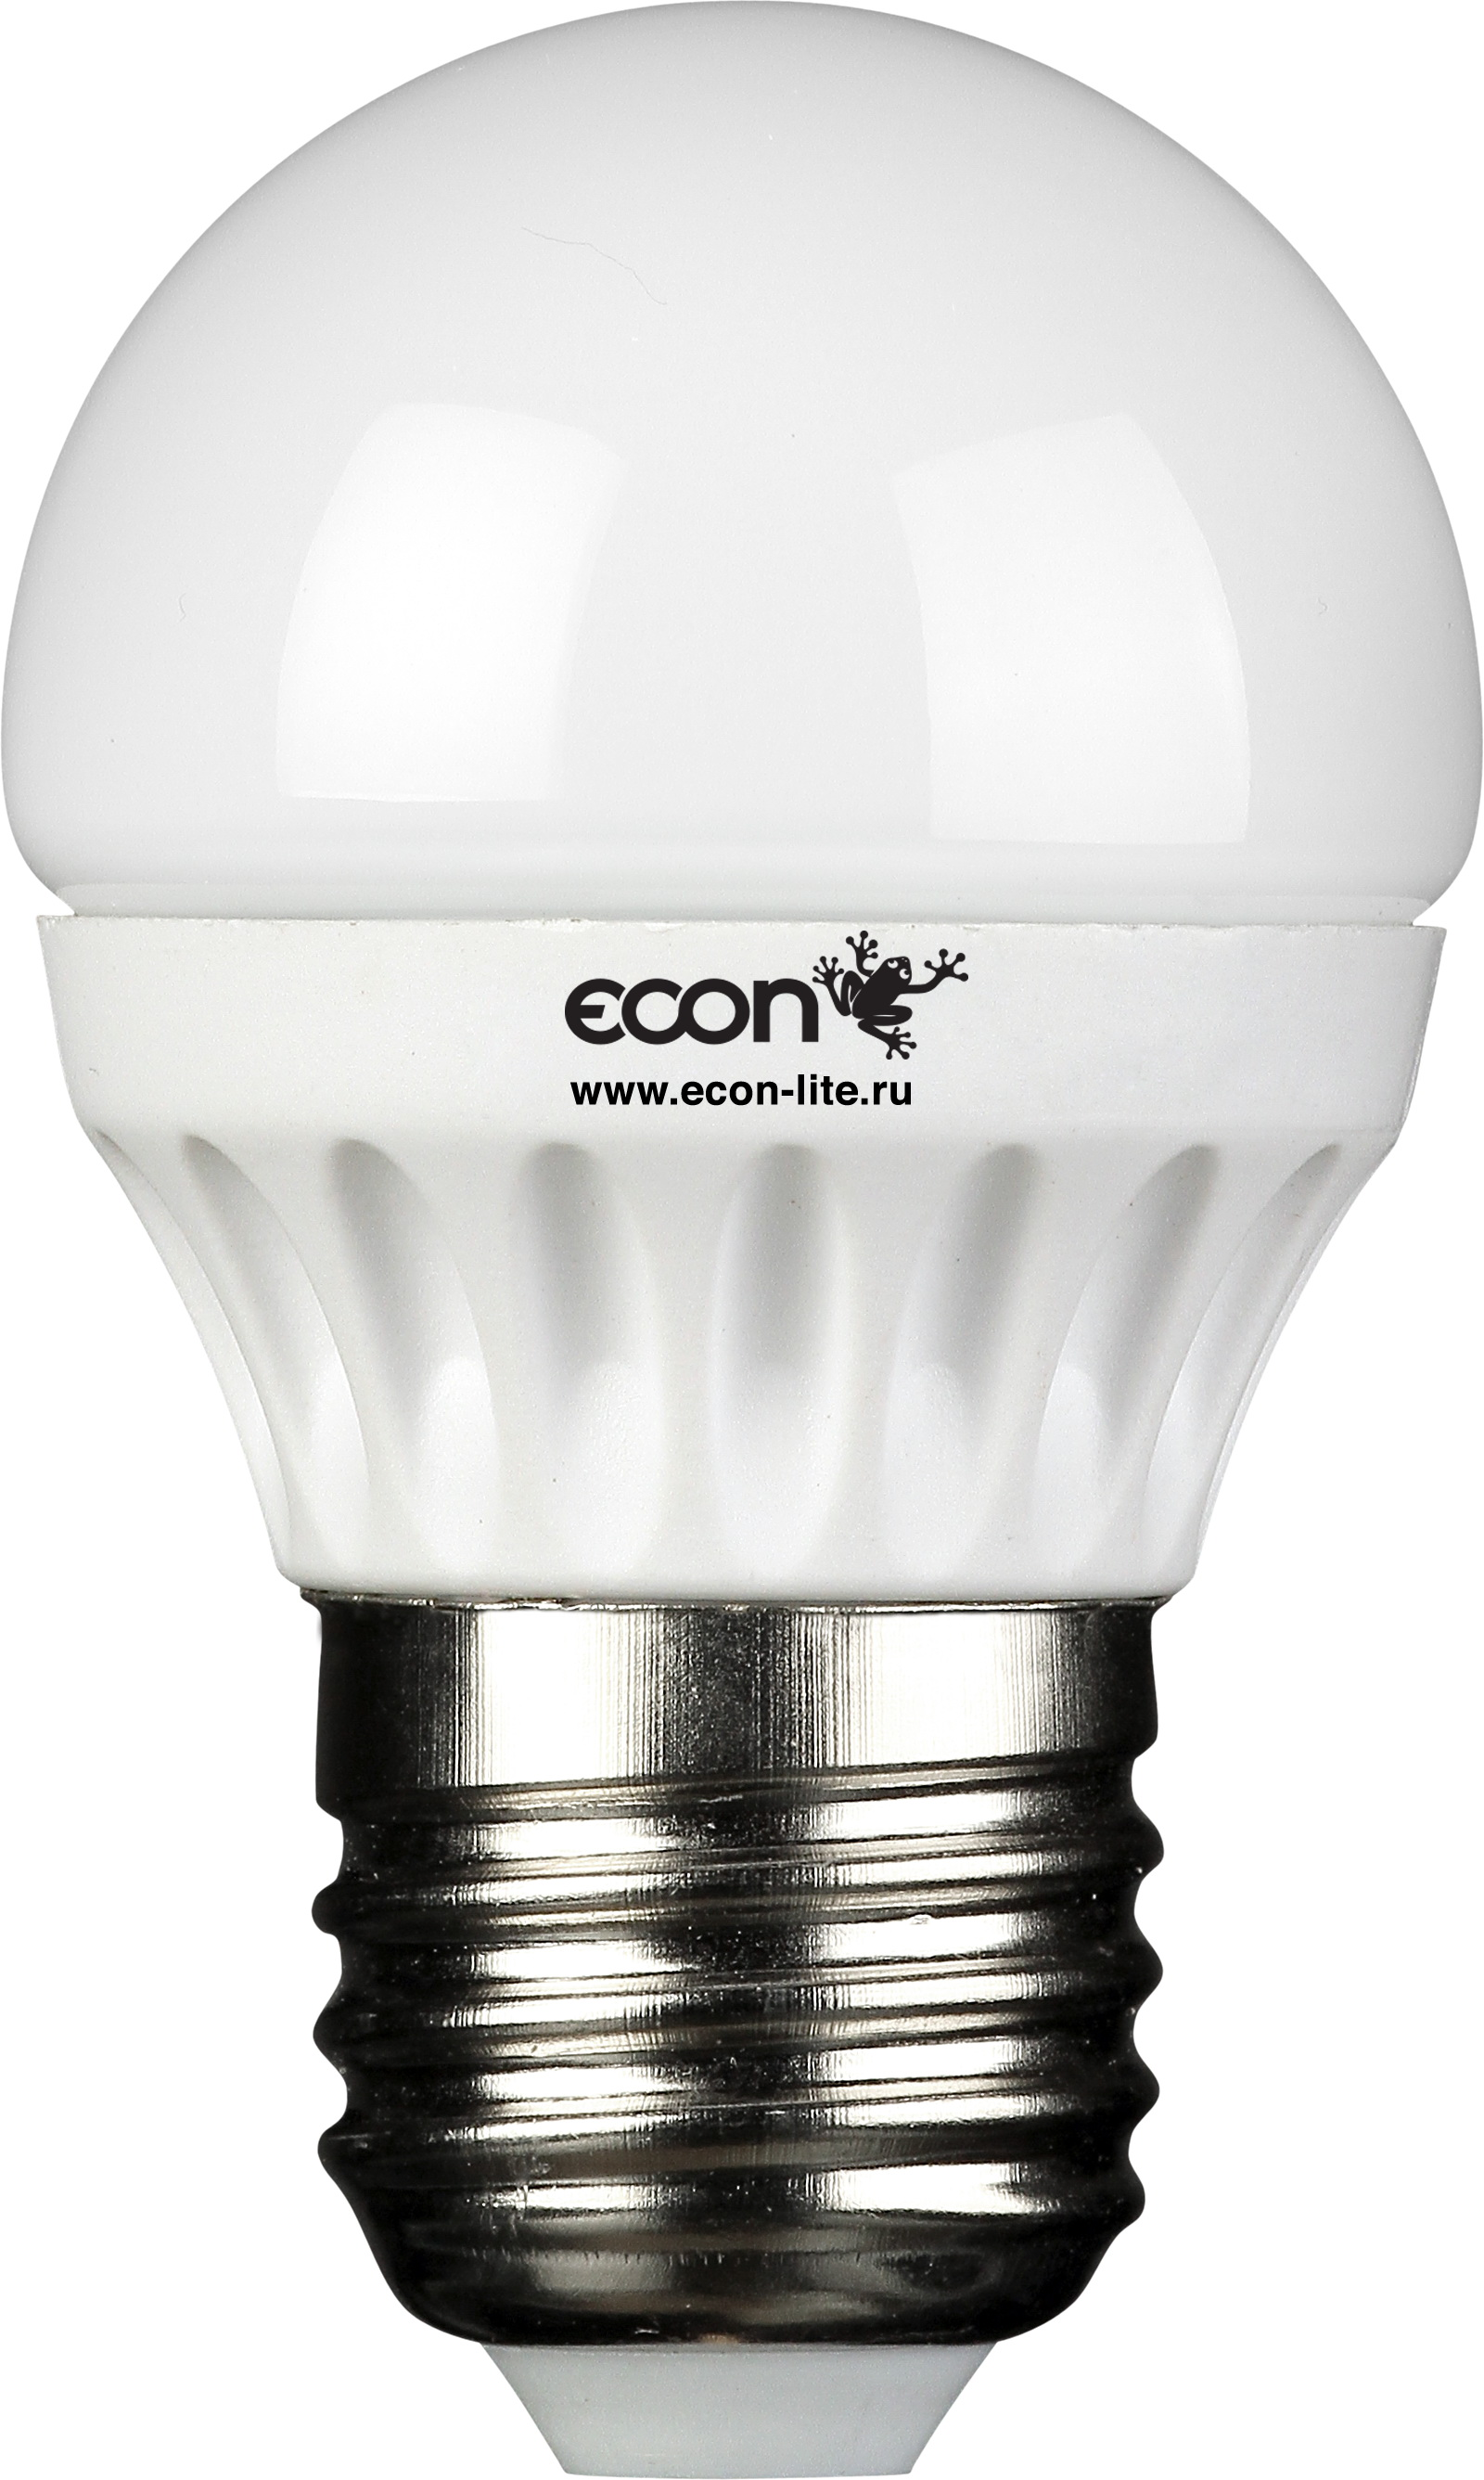 Лампа светодиодная Econ Led p 5Вт e27 3000k p45